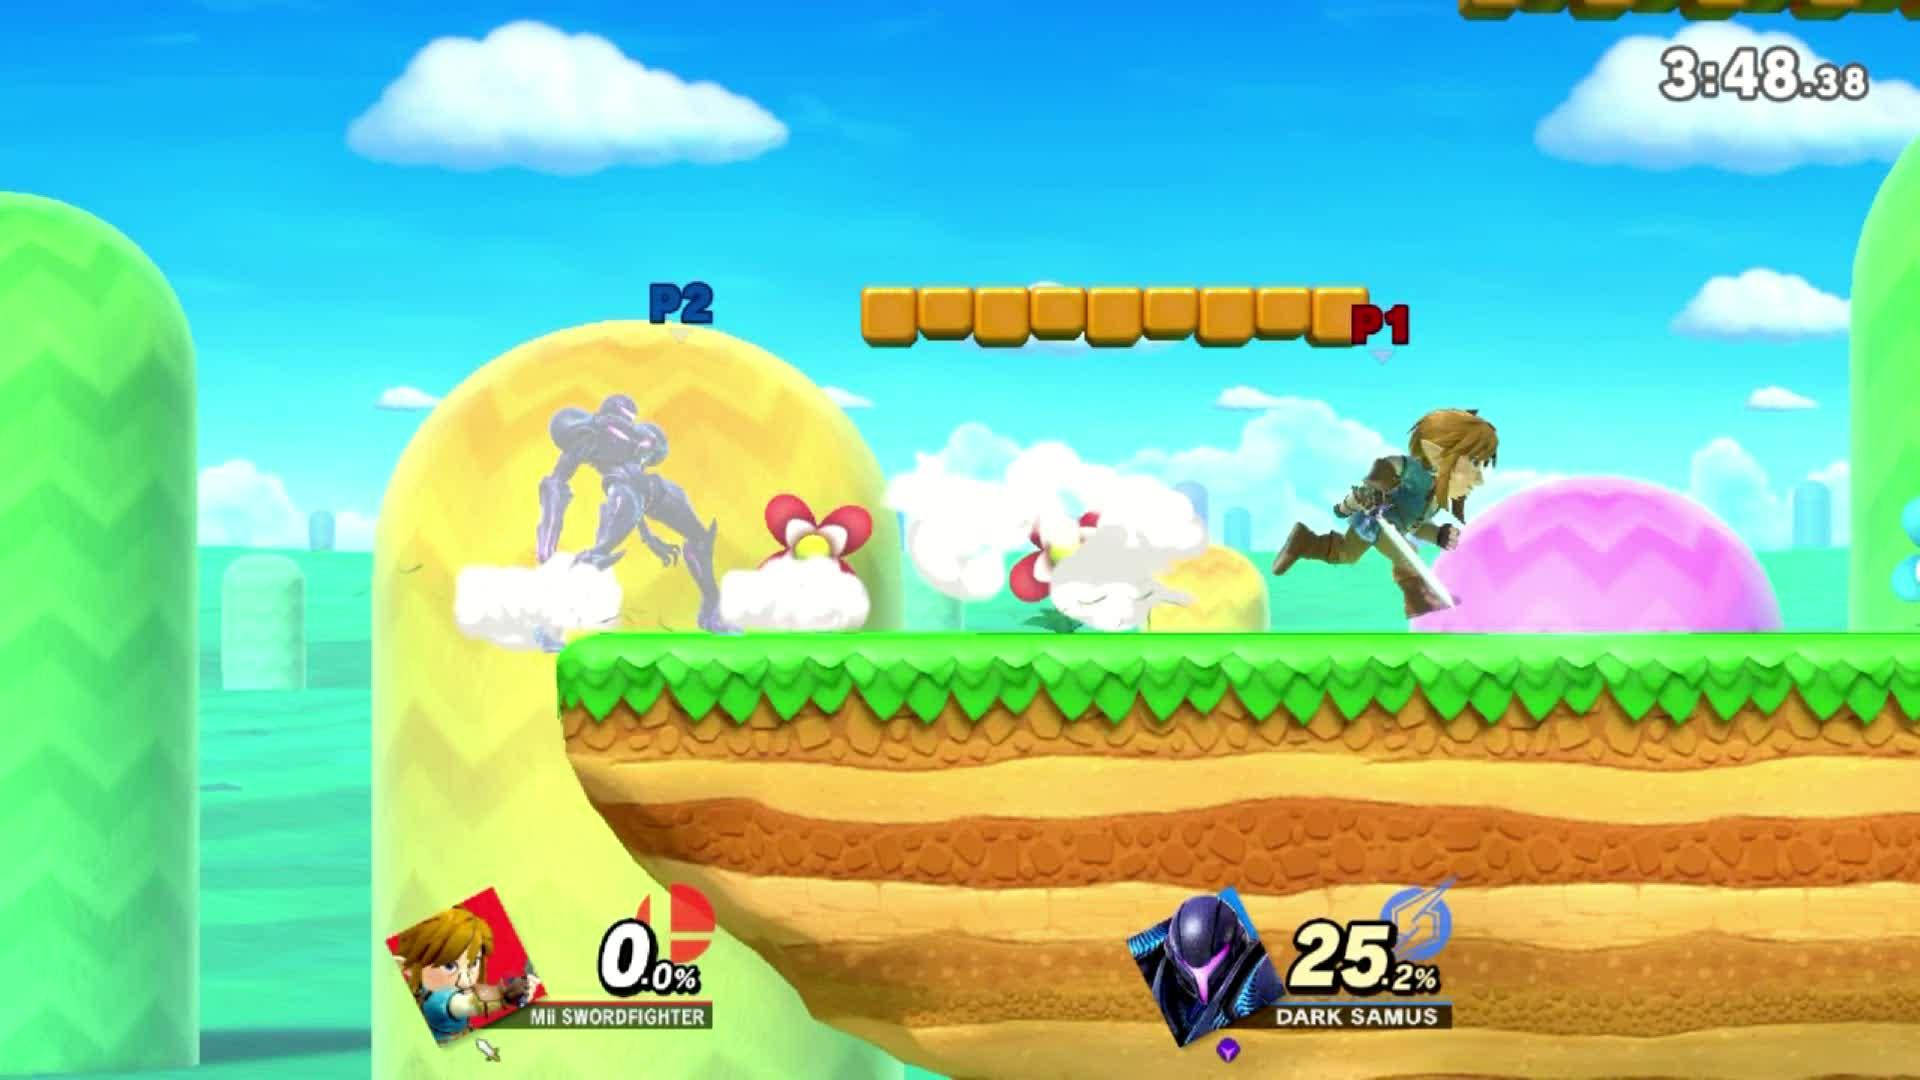 Dark Samus, SSBU, Smash Ultimate, Super Smash Bros. Dark Samus, Super Smash Bros. Samus, Super Smash Bros. Ultimate, From 0 to 74 in 4 seconds GIFs